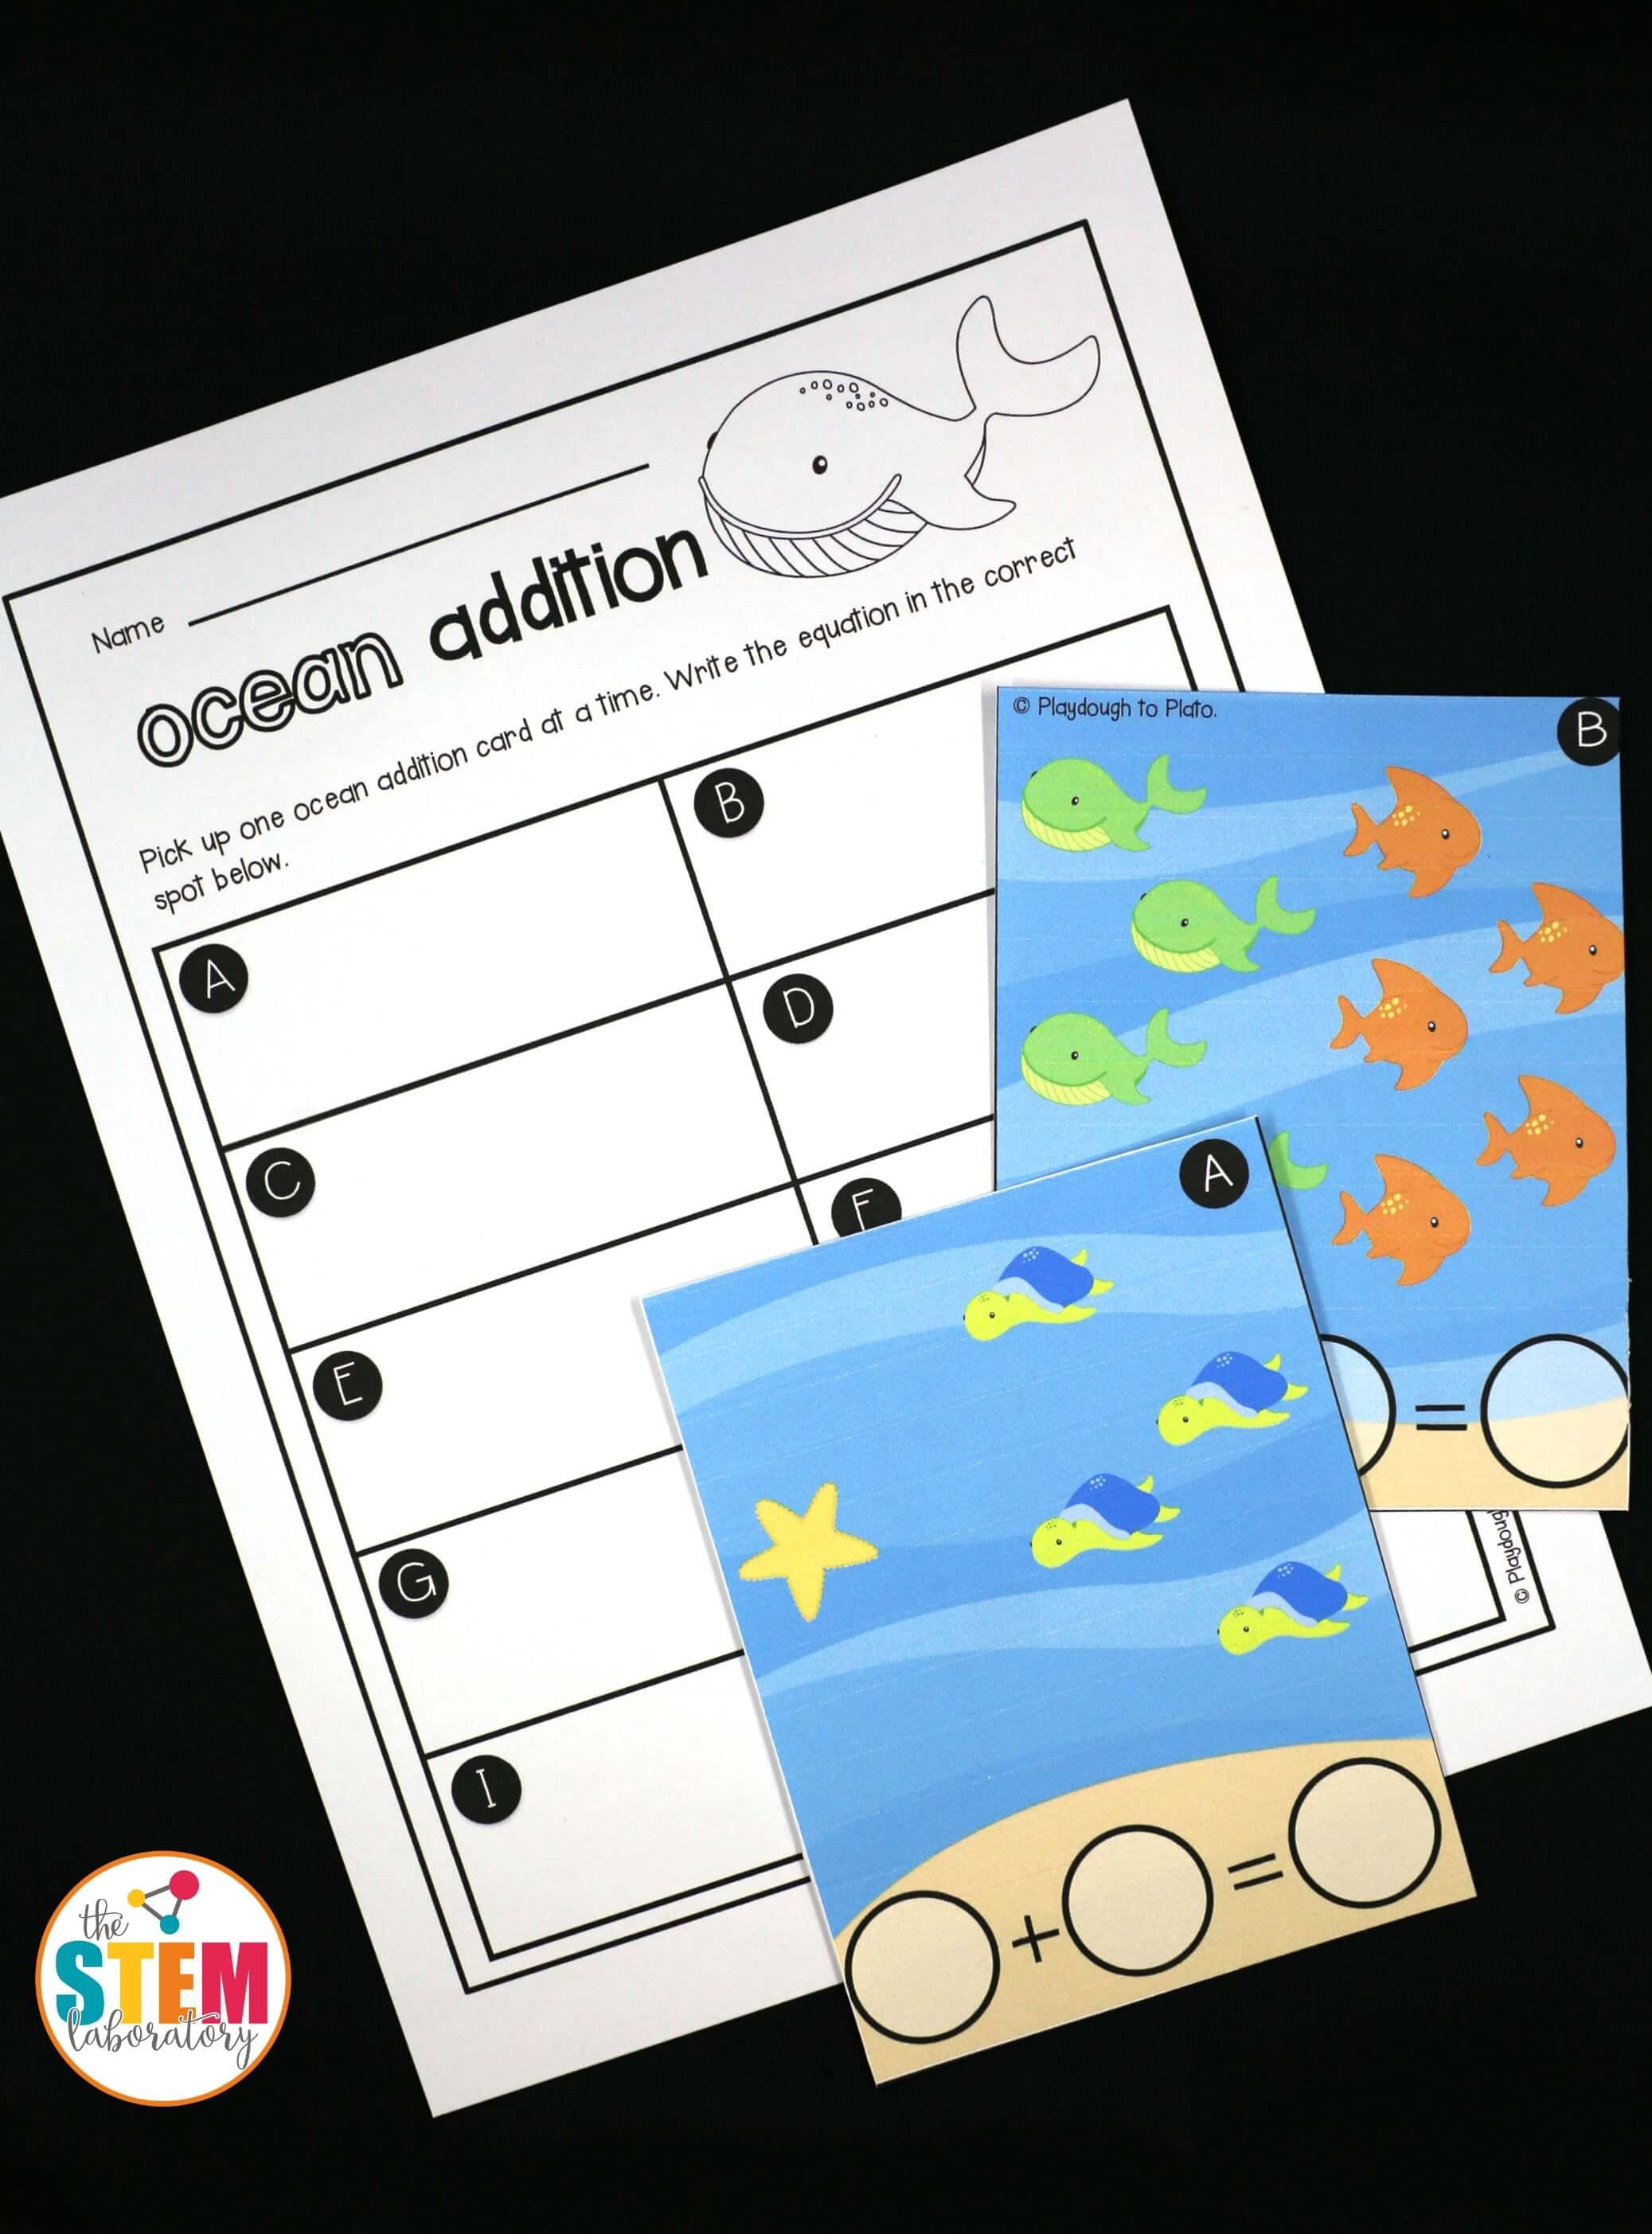 Ocean Addition Activity